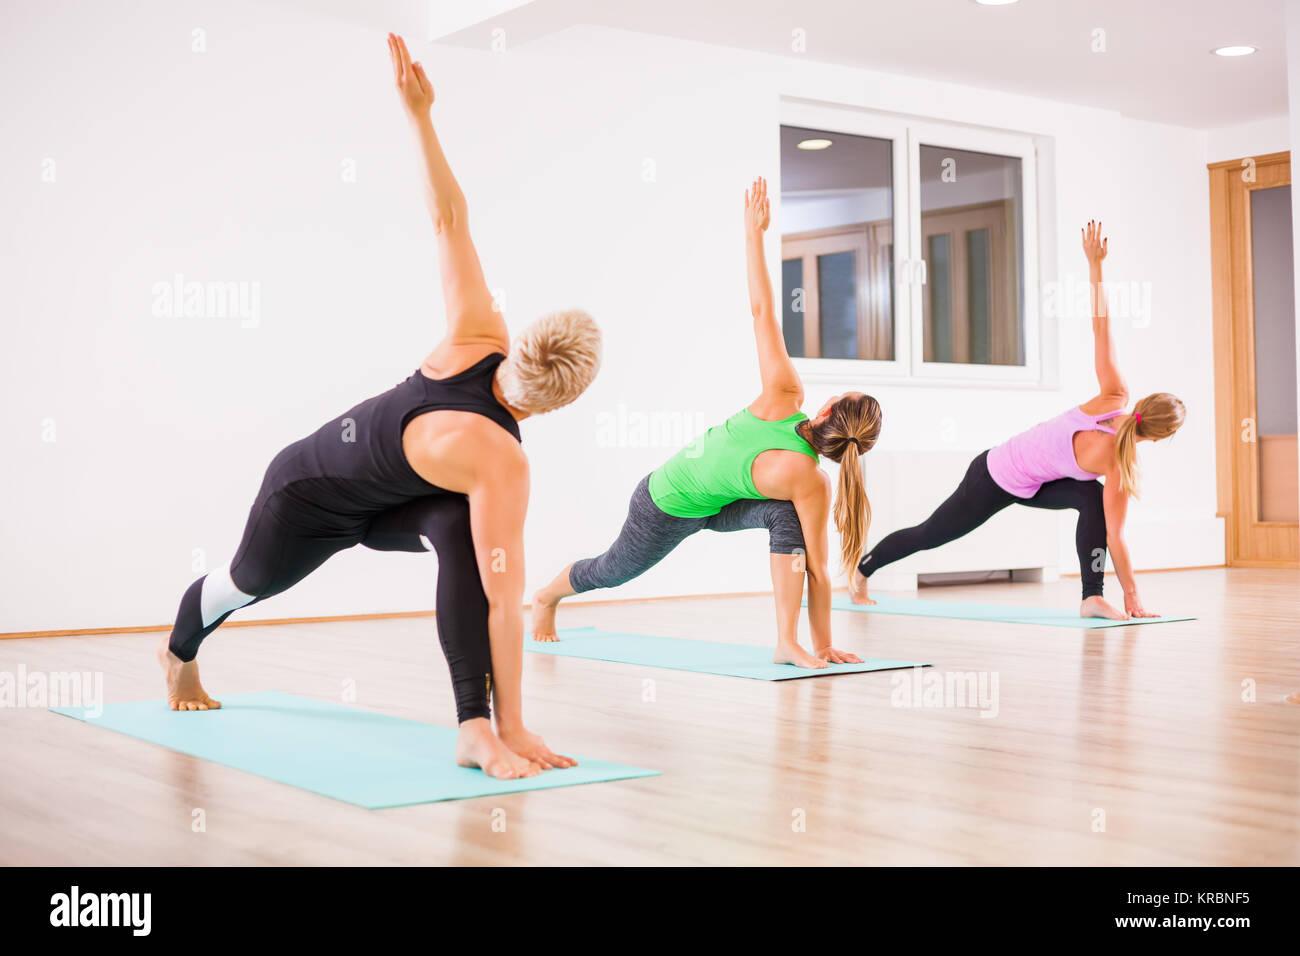 Three girls practicing yoga, Trikonasana / Bikram triangle right pose - Stock Image